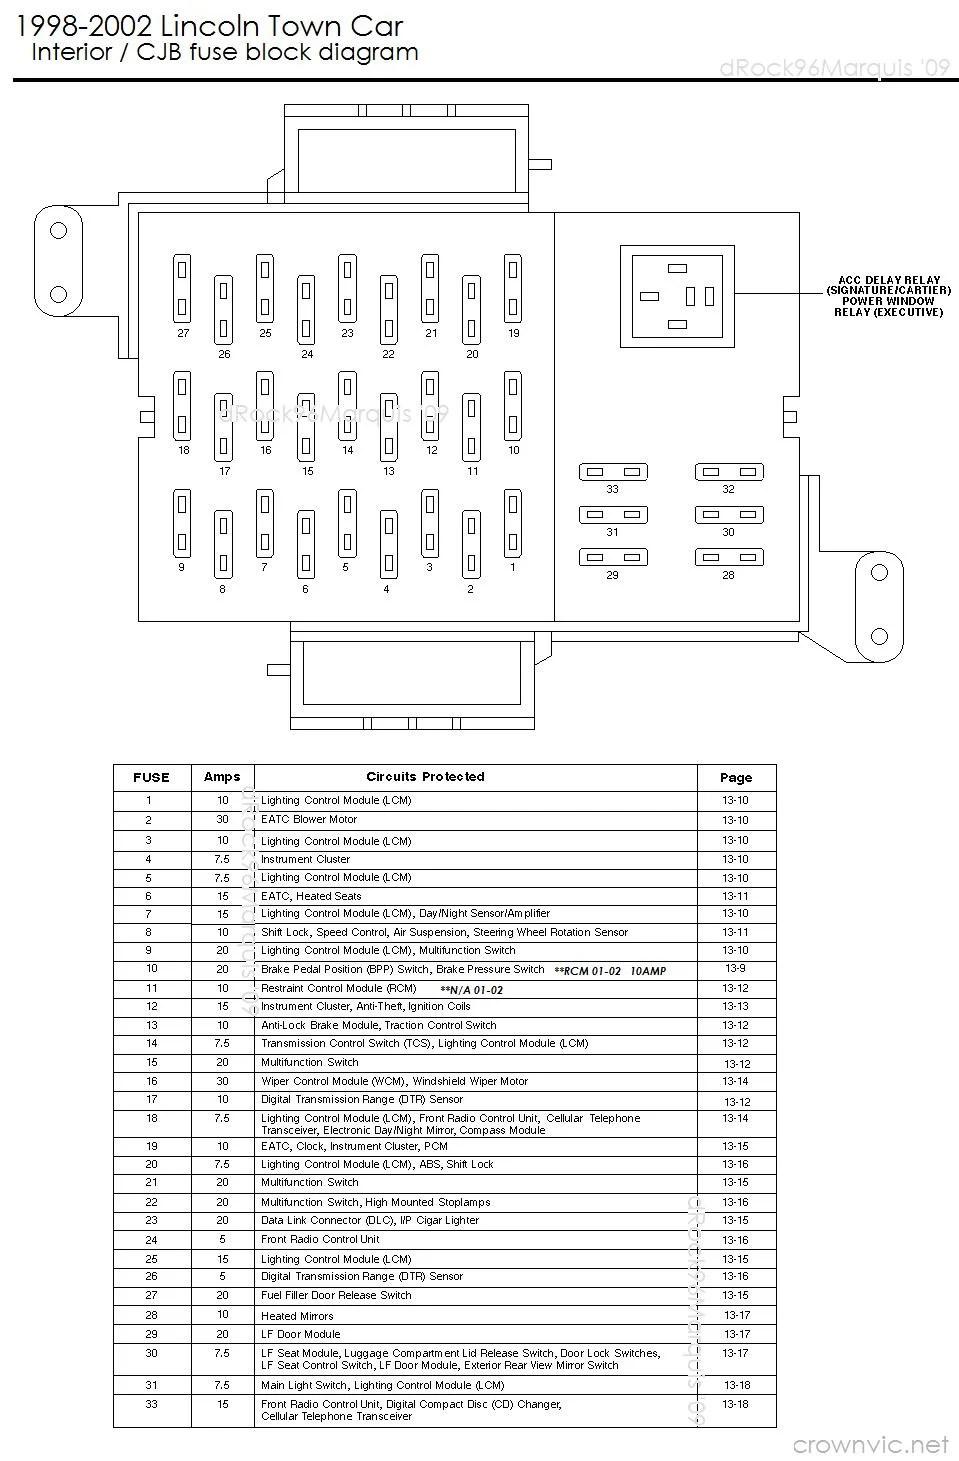 2003 Ford Ranger Interior Fuse Box Diagram